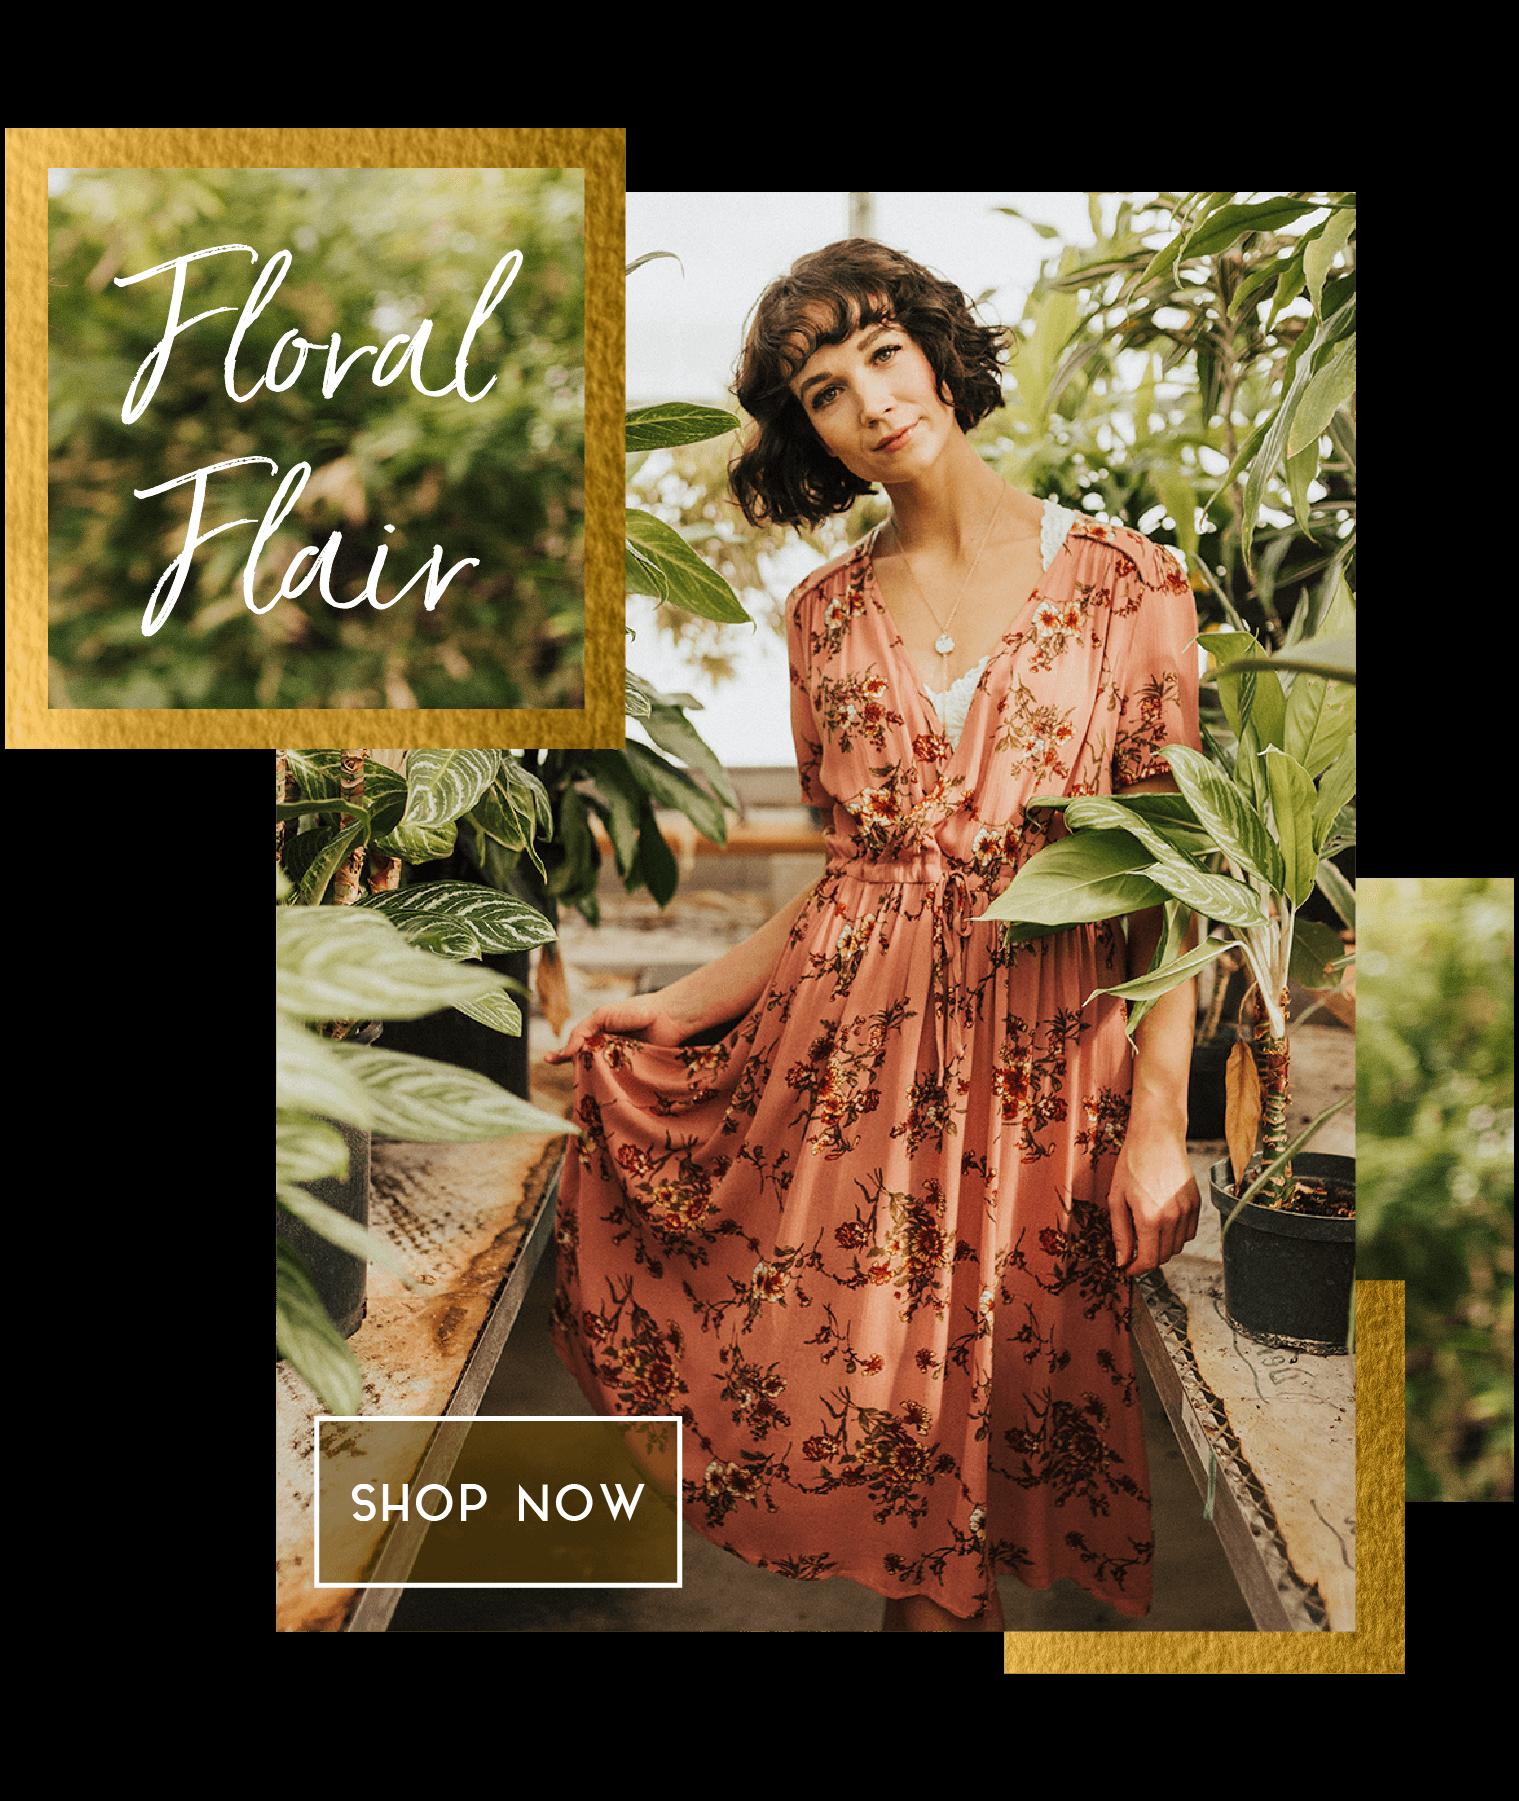 Online Boutique Clothing for Women  18634a438a5e